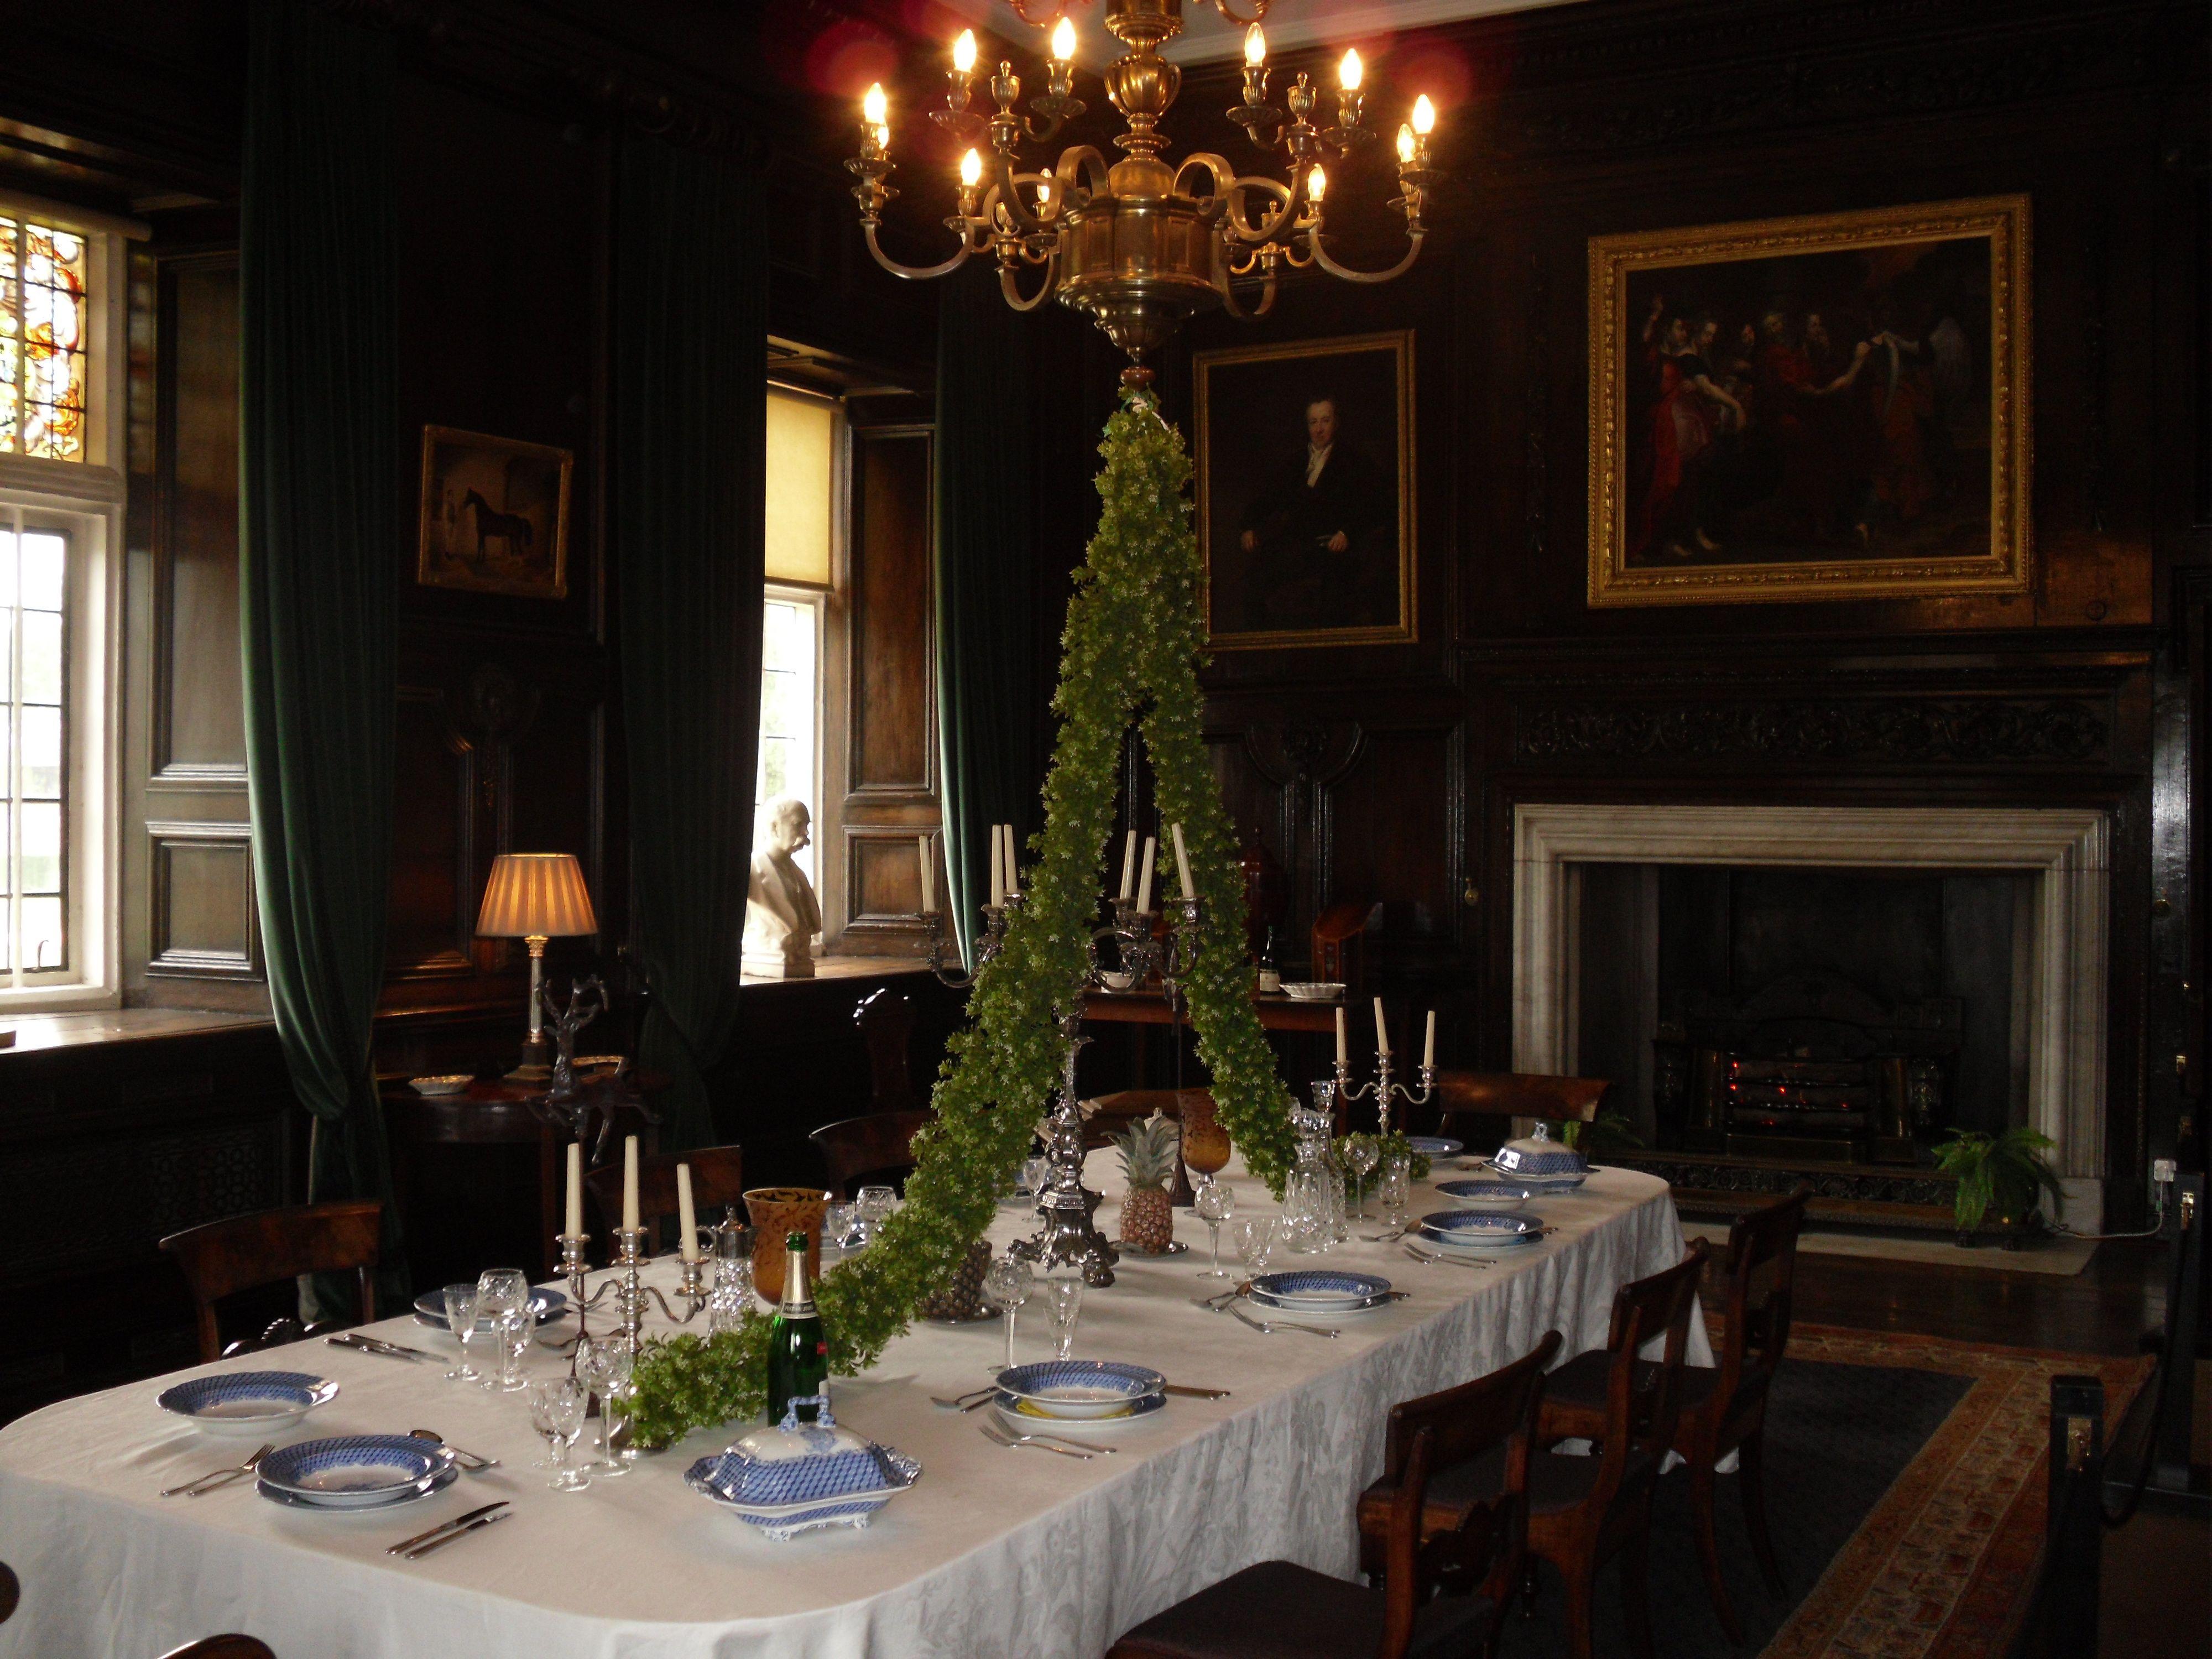 Victorian Dining  Google Search  Victoriana Gothic Wedding Amazing Victorian Dining Room Decor Inspiration Design